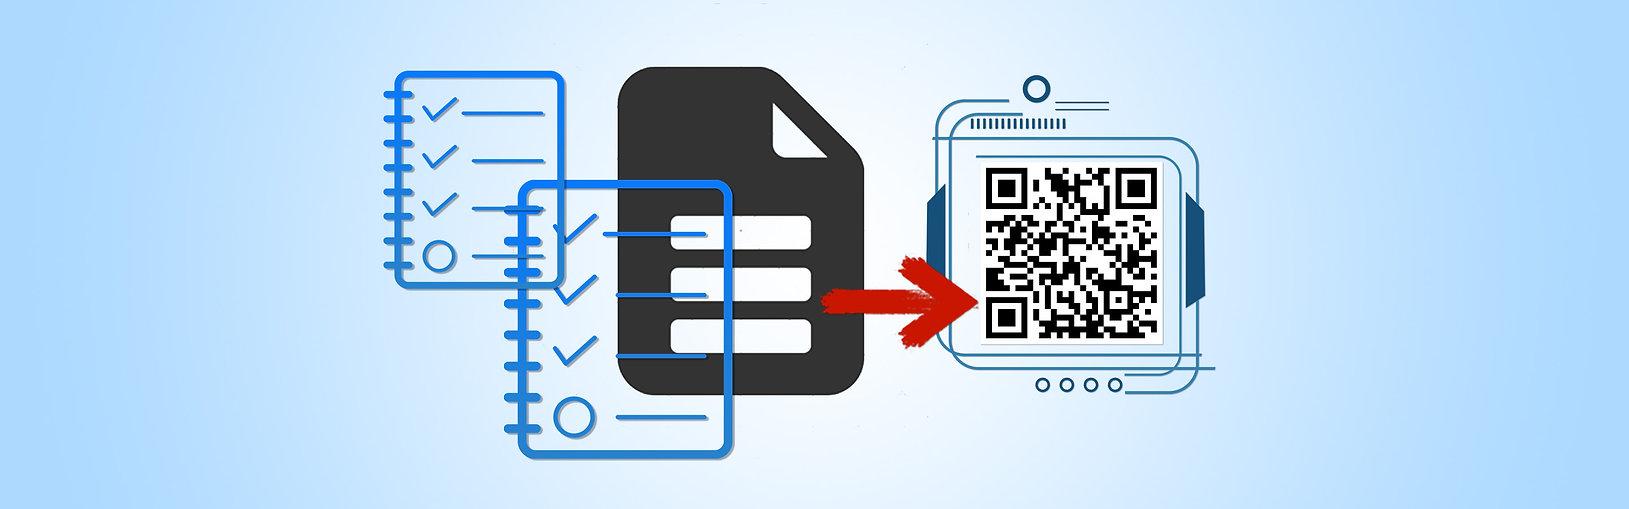 PDFWriterSolution_Big.jpg